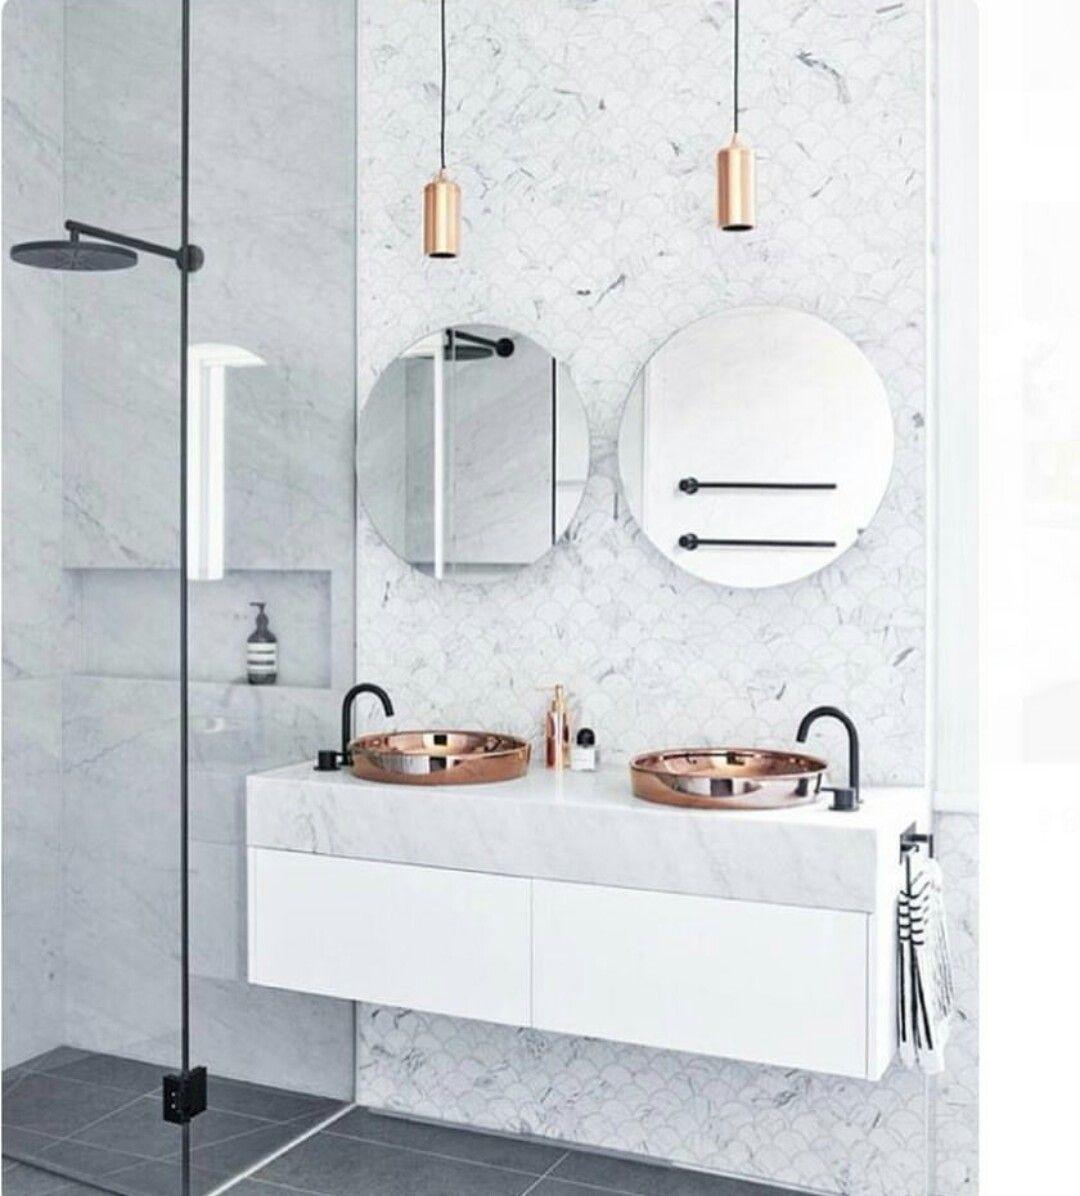 Pin by ZoZorana on Bathroom | Pinterest | House goals, Bath and ...